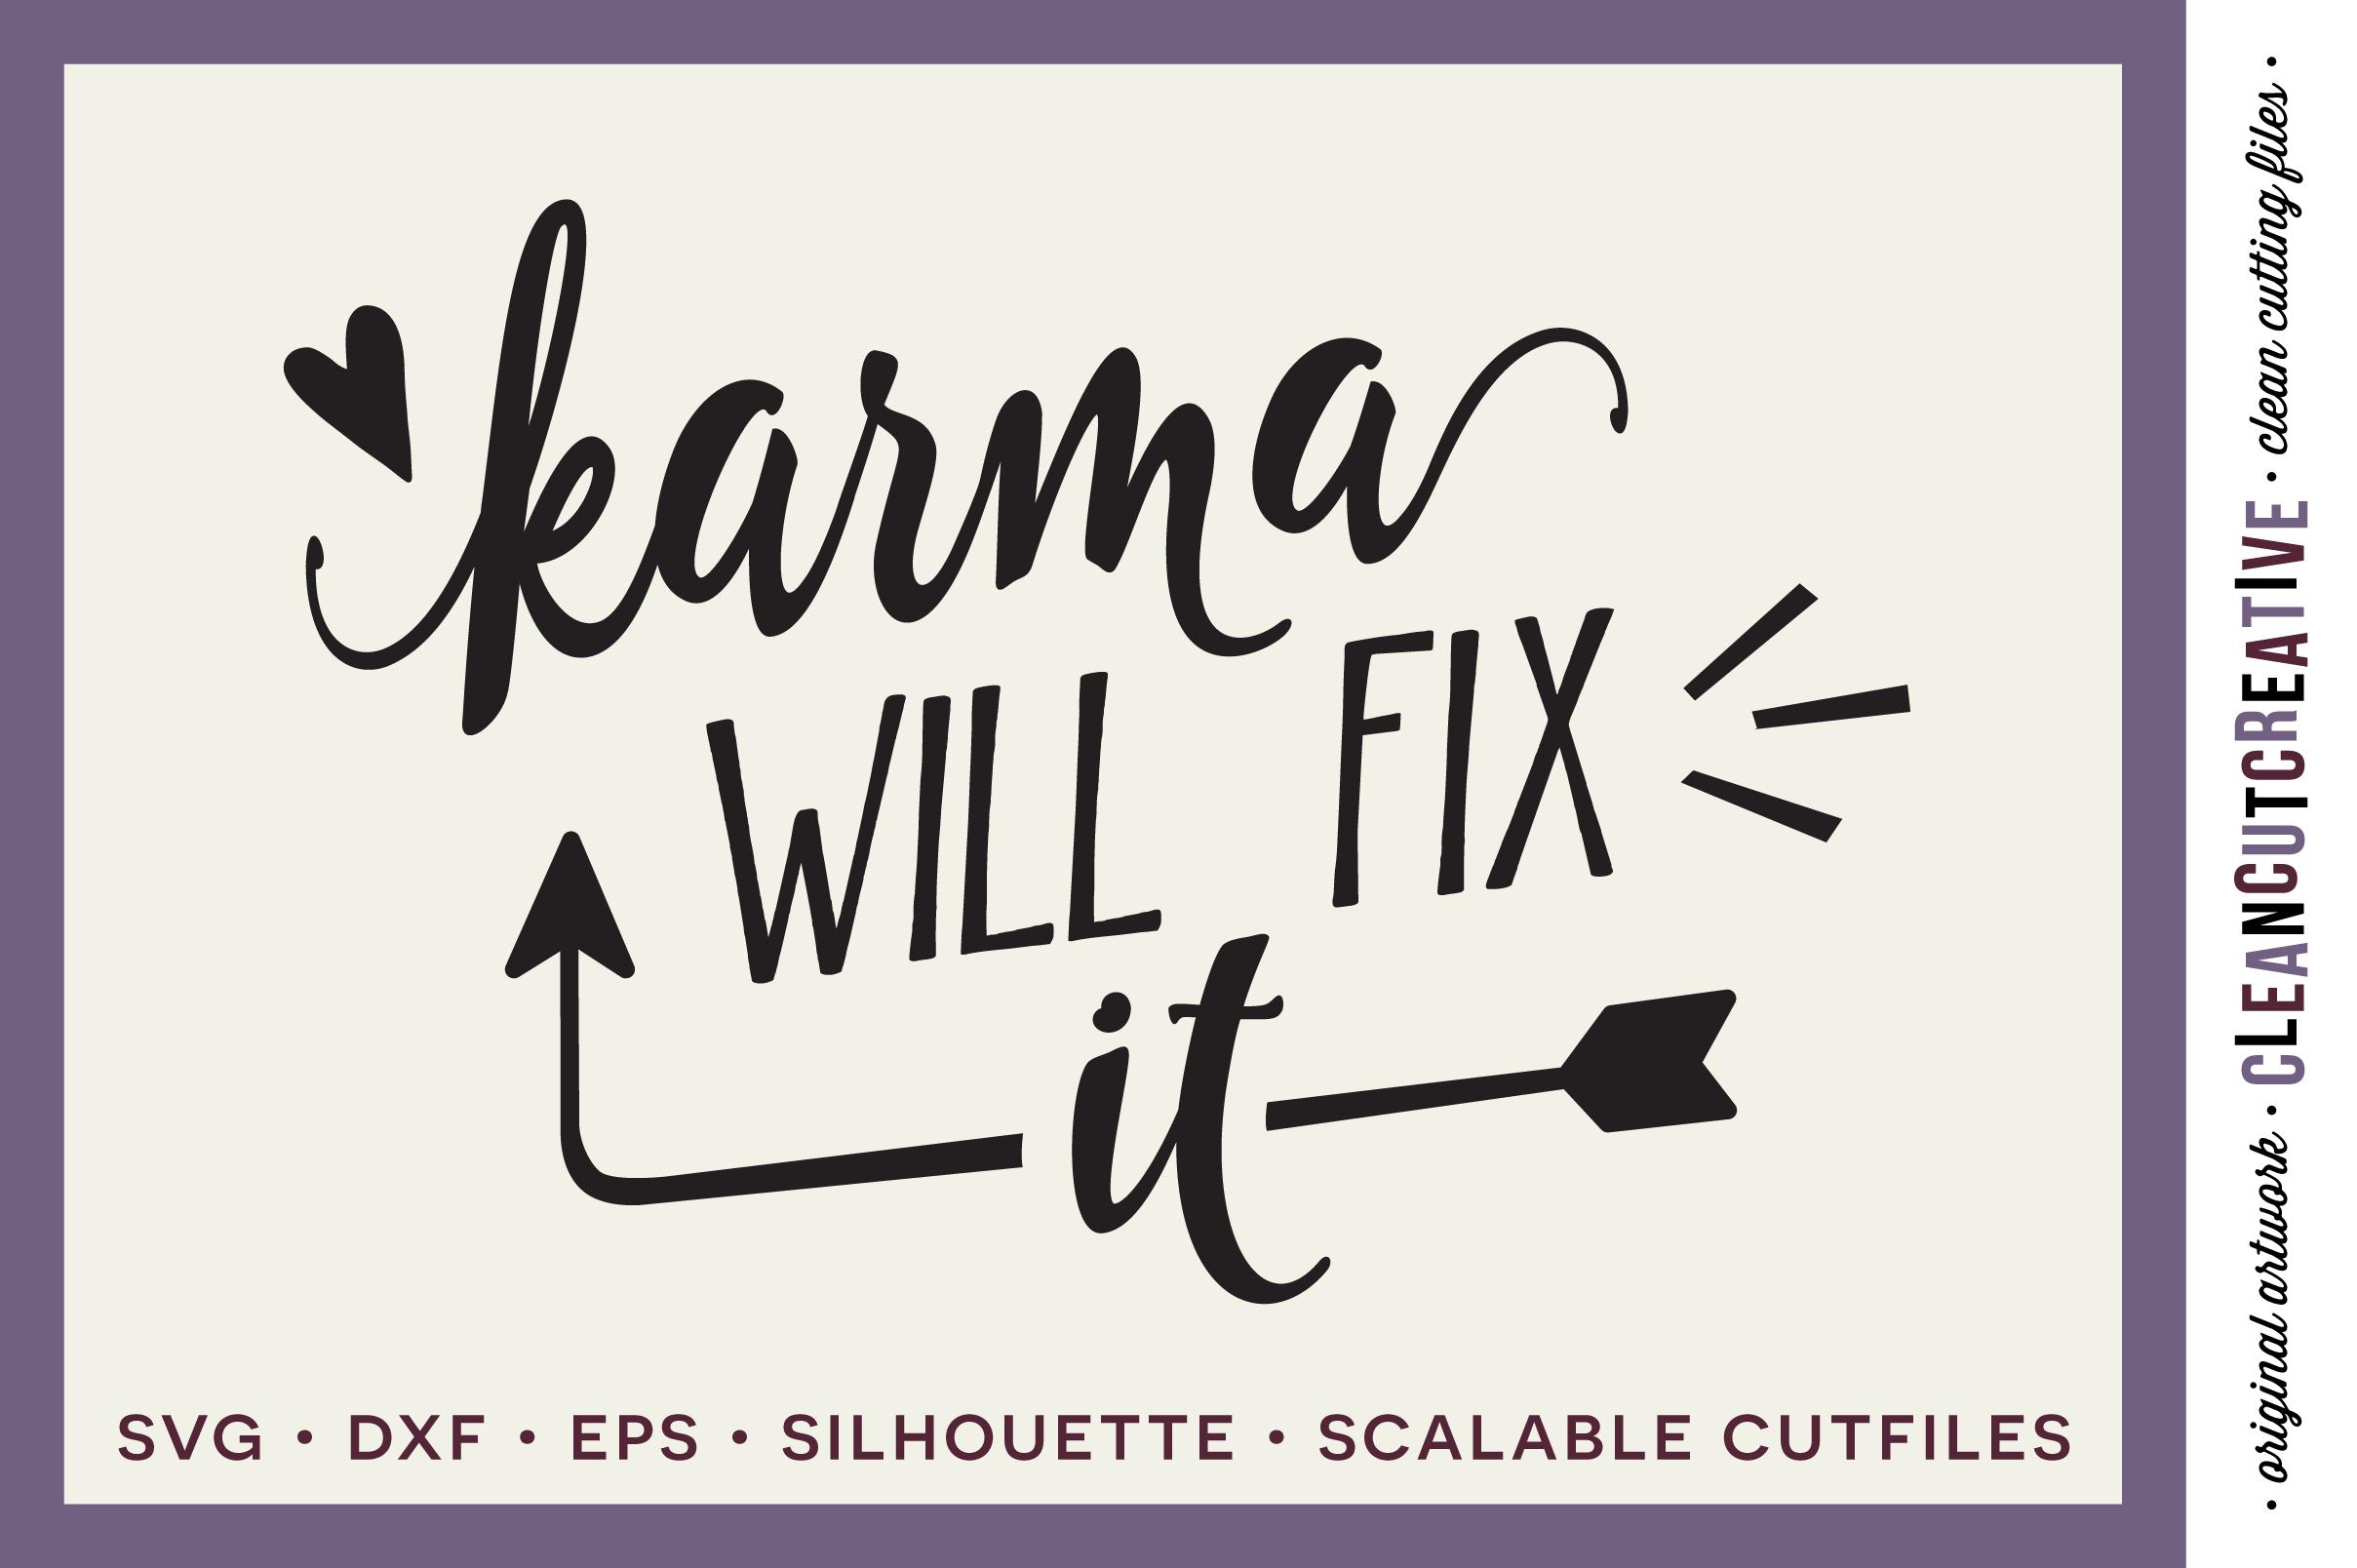 Funny Quote - Karma Will Fix It! - SVG | Design Bundles